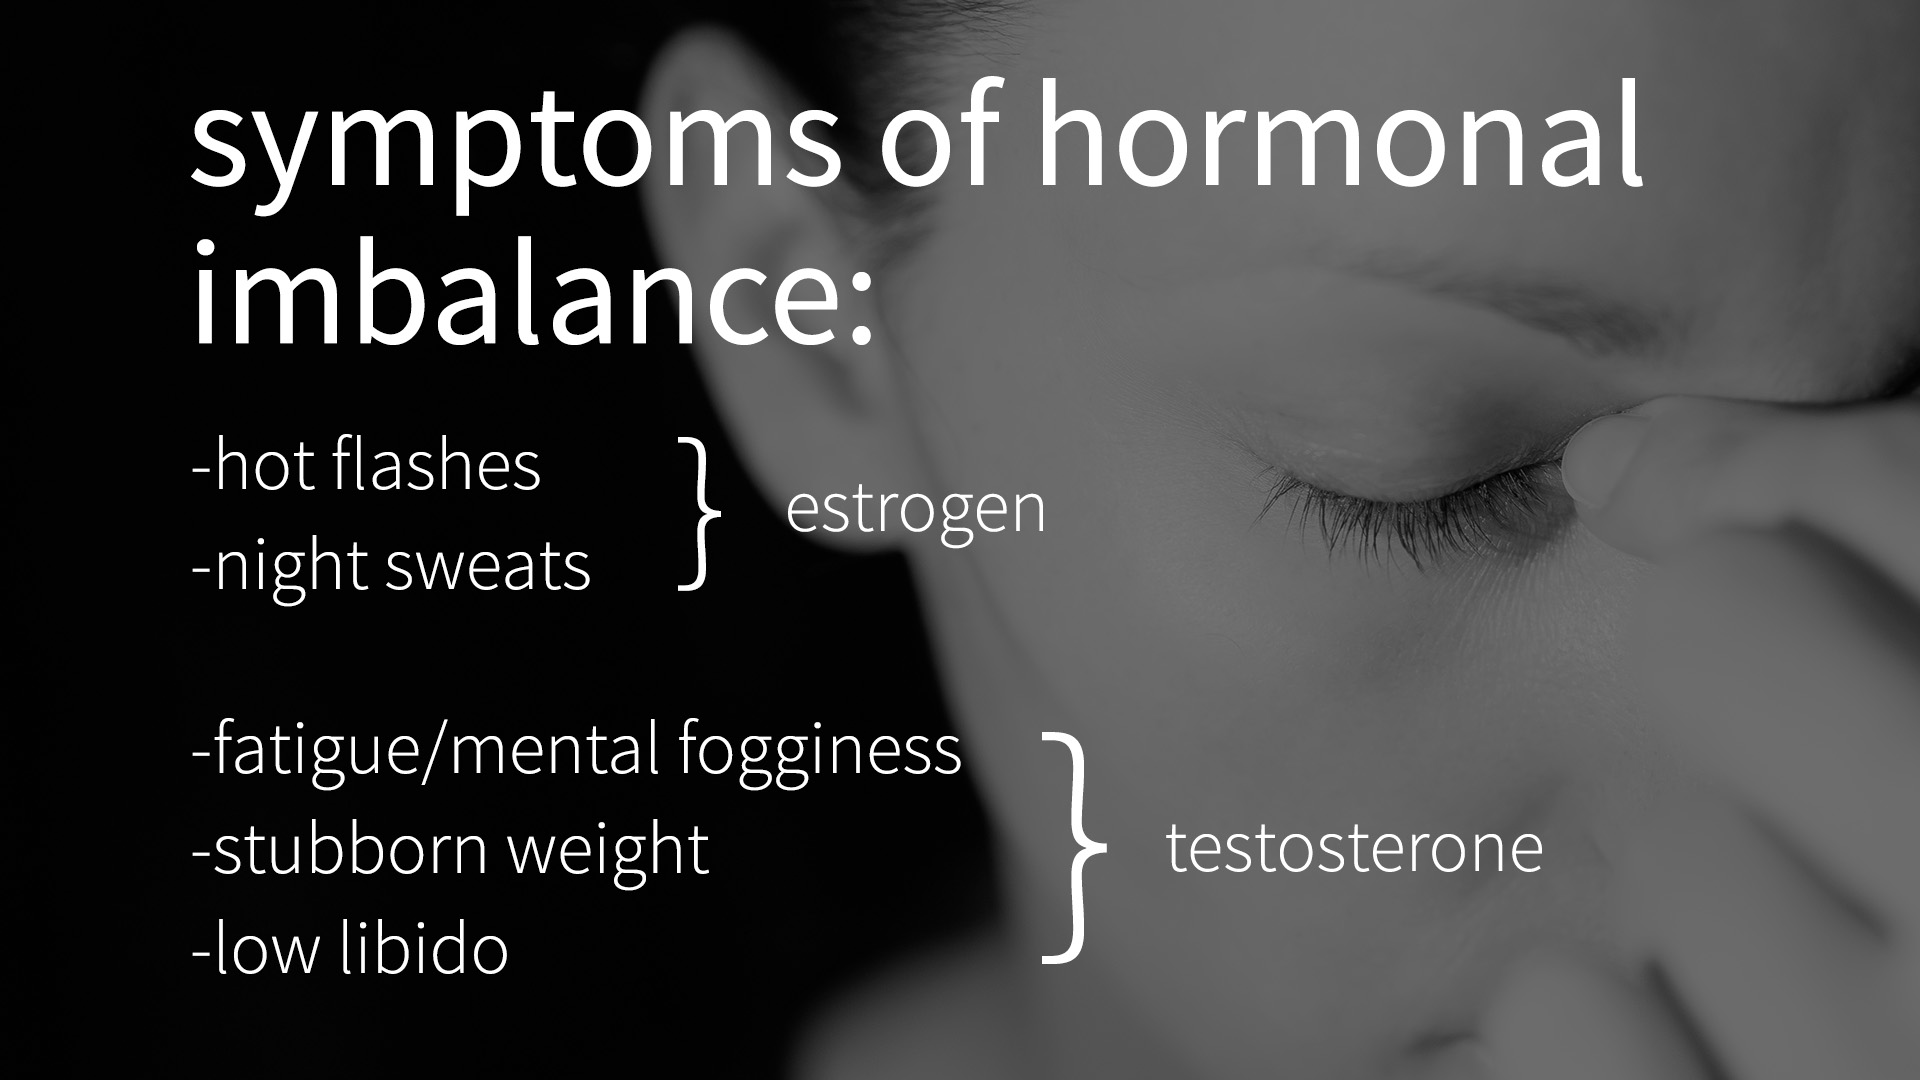 hormonal imbalance, hrt, estrogen, testosterone